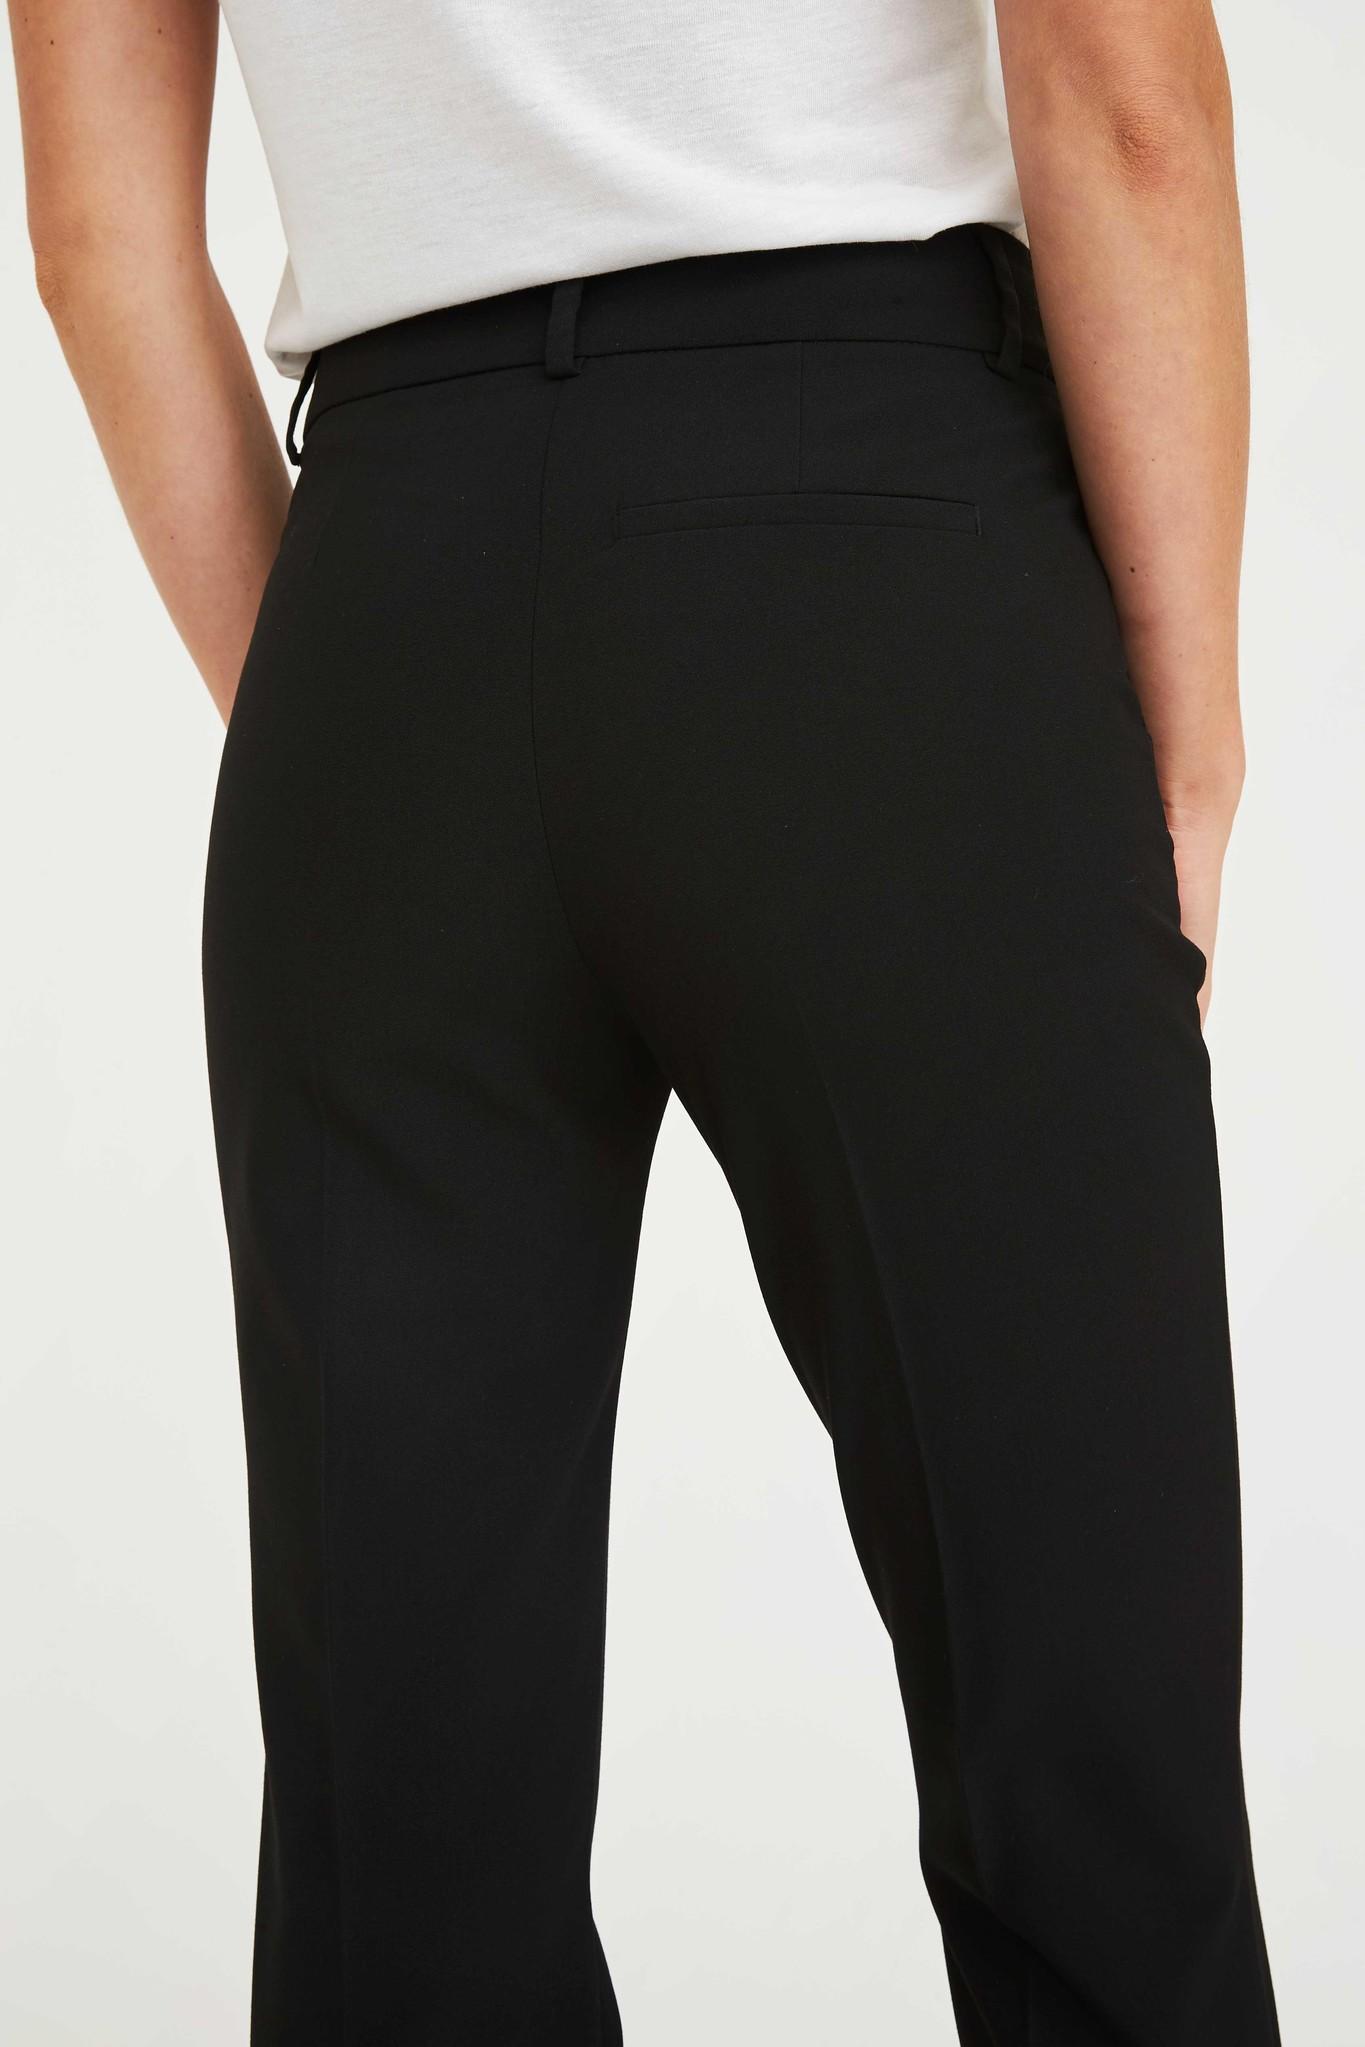 Clara 285 Long Pants - Black Glow-4